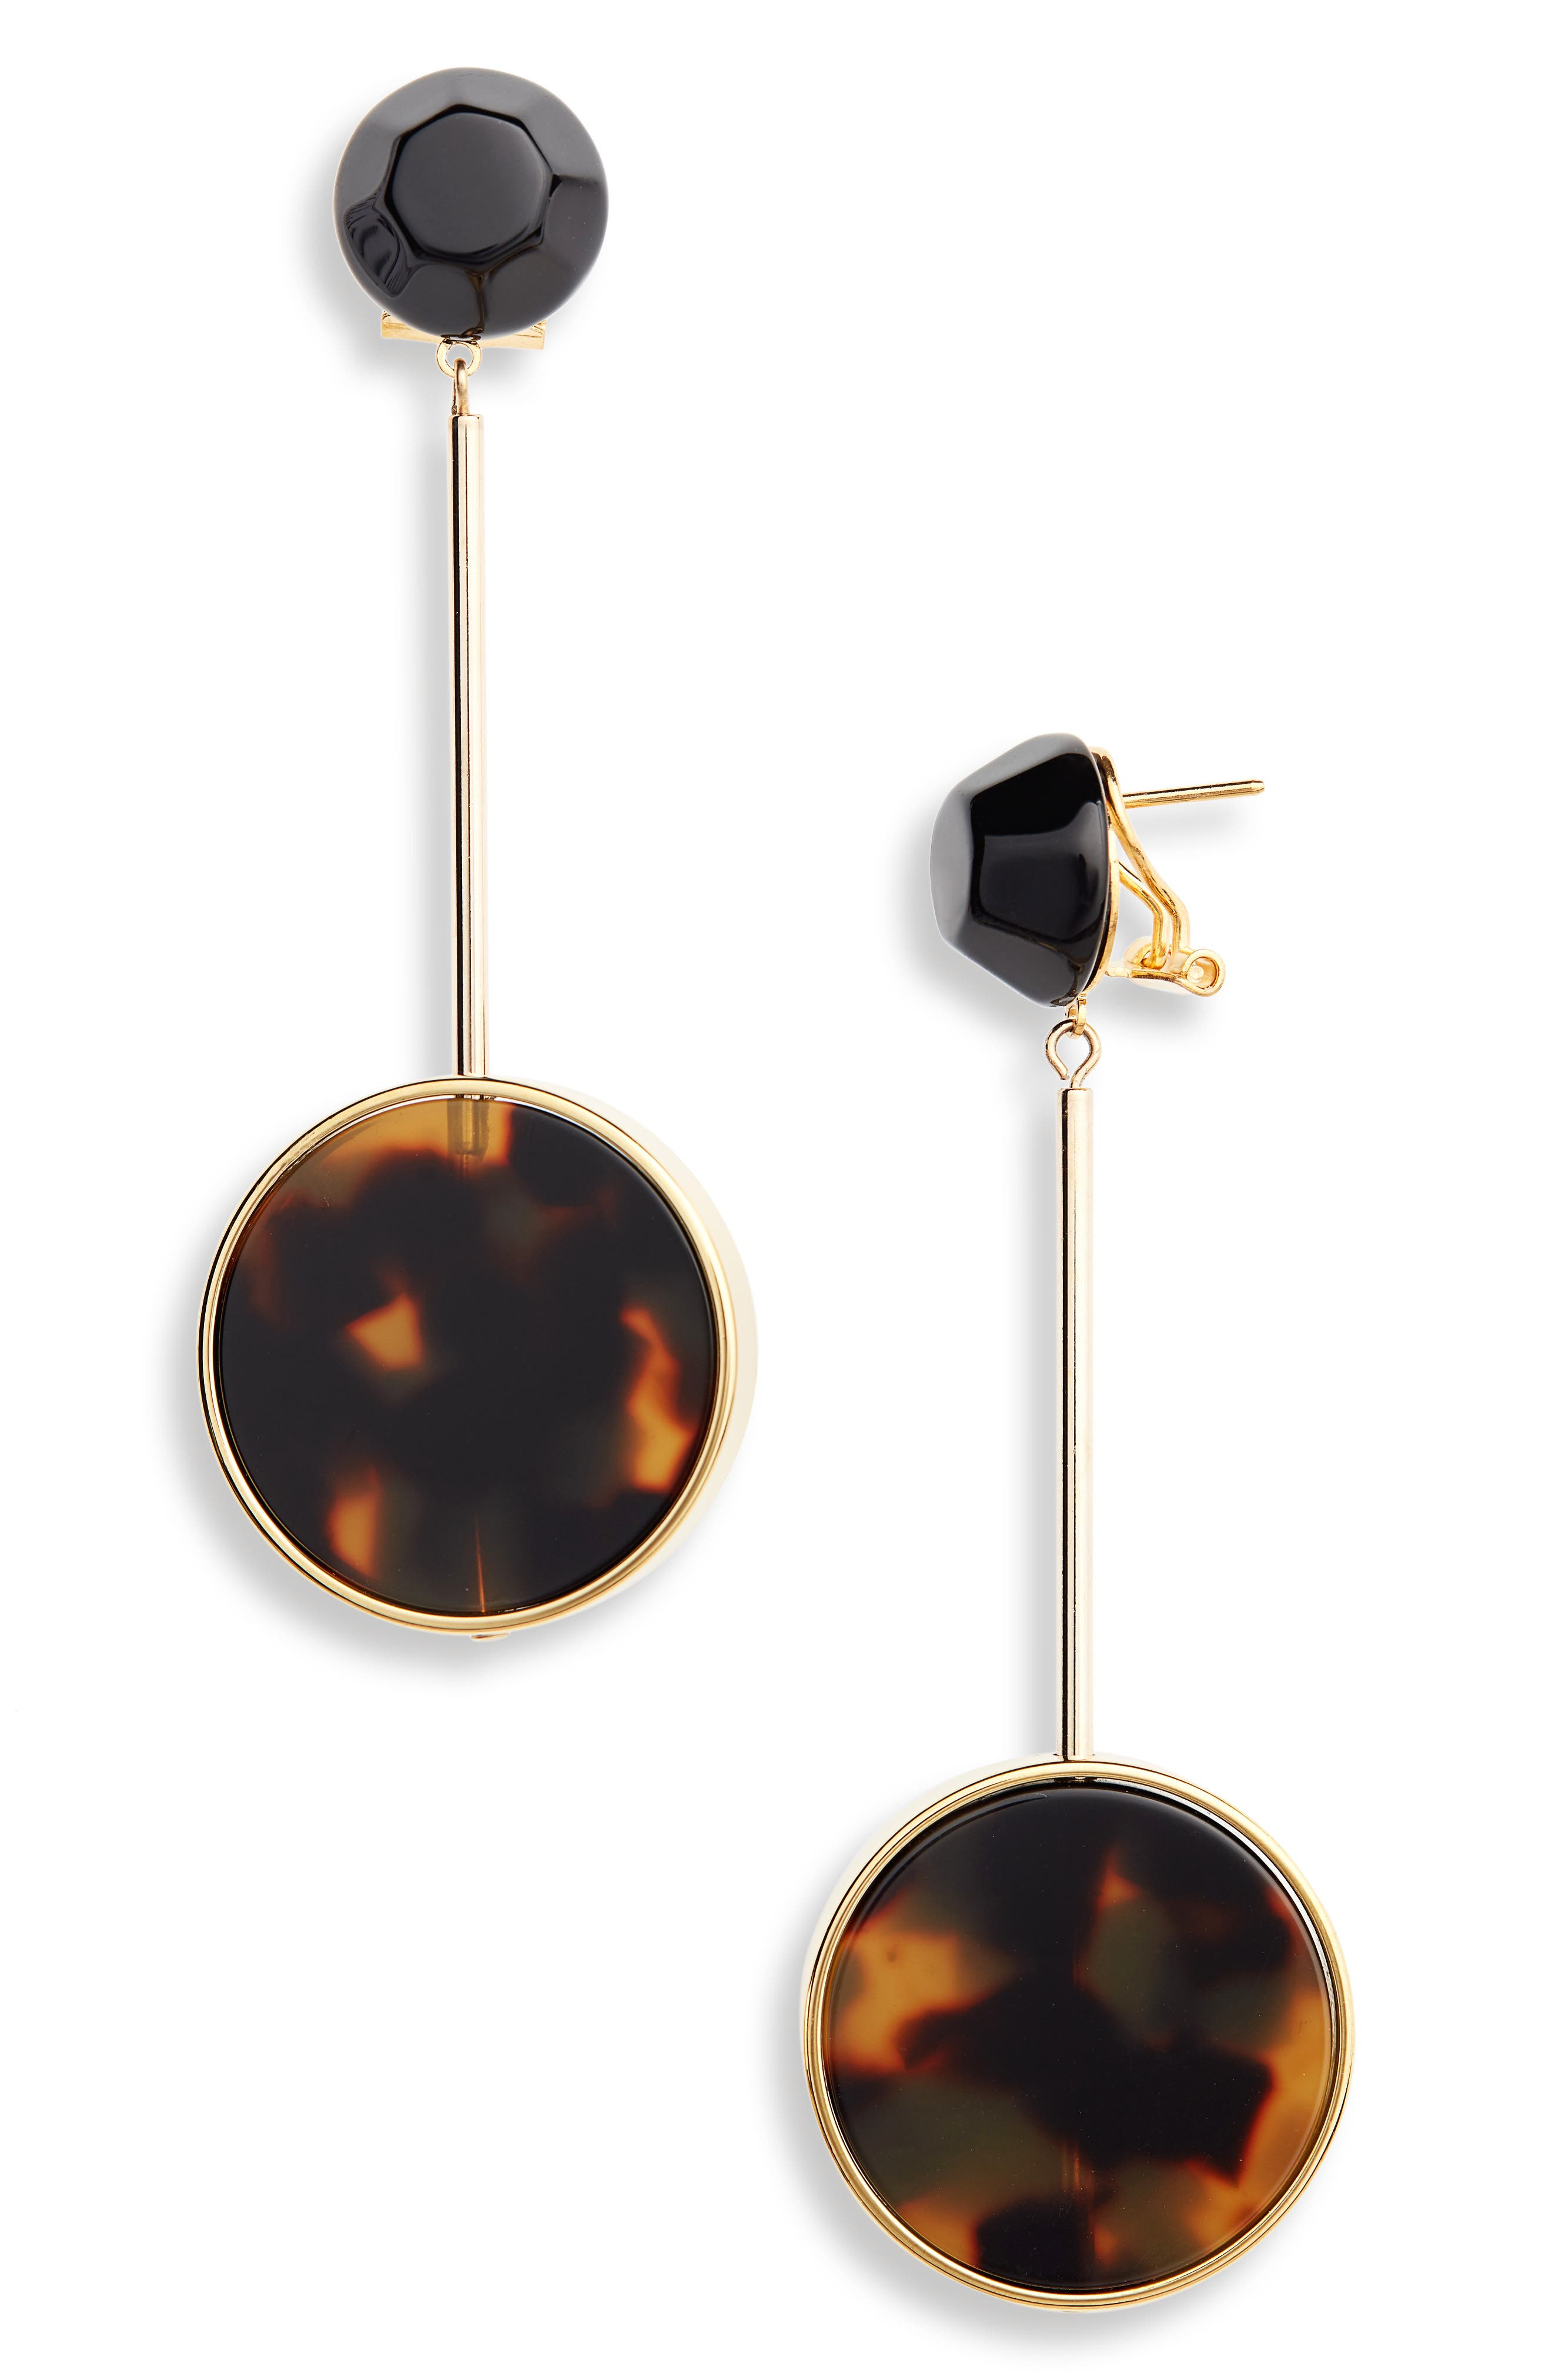 Lhasa Drop Earrings,                             Main thumbnail 1, color,                             001